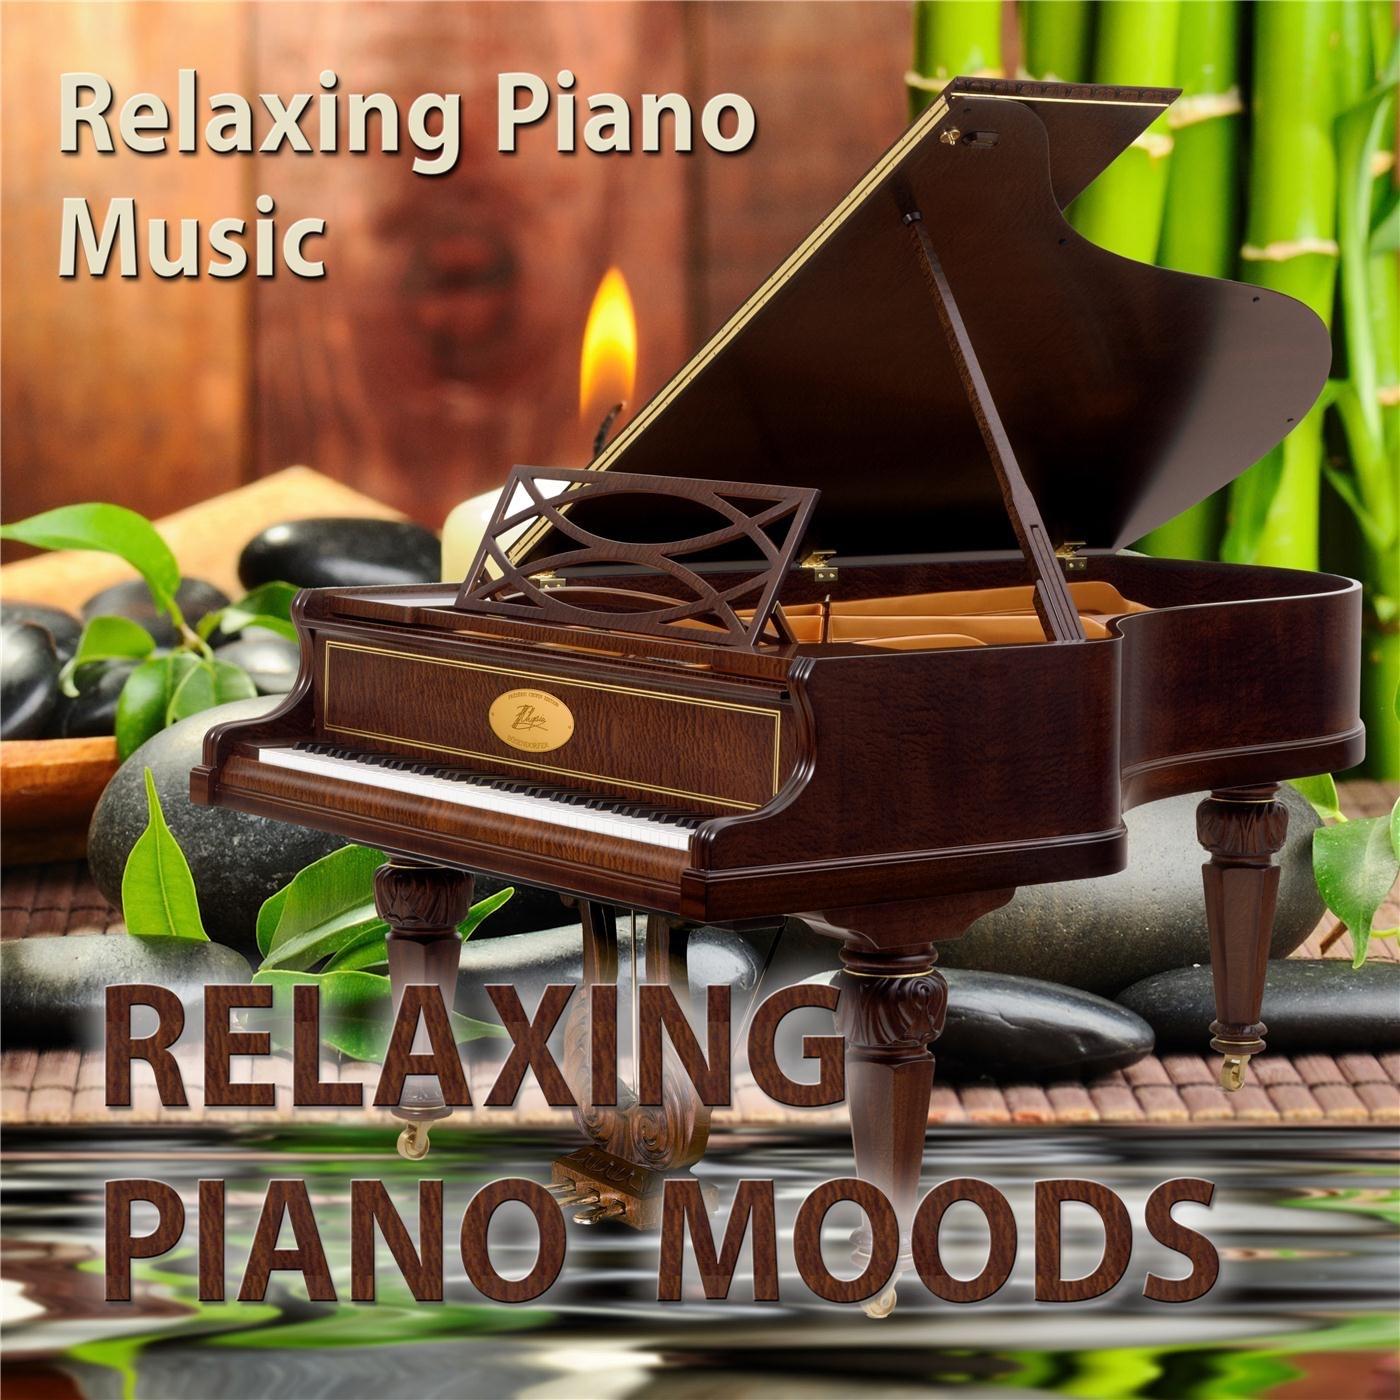 Relaxing Piano Moods